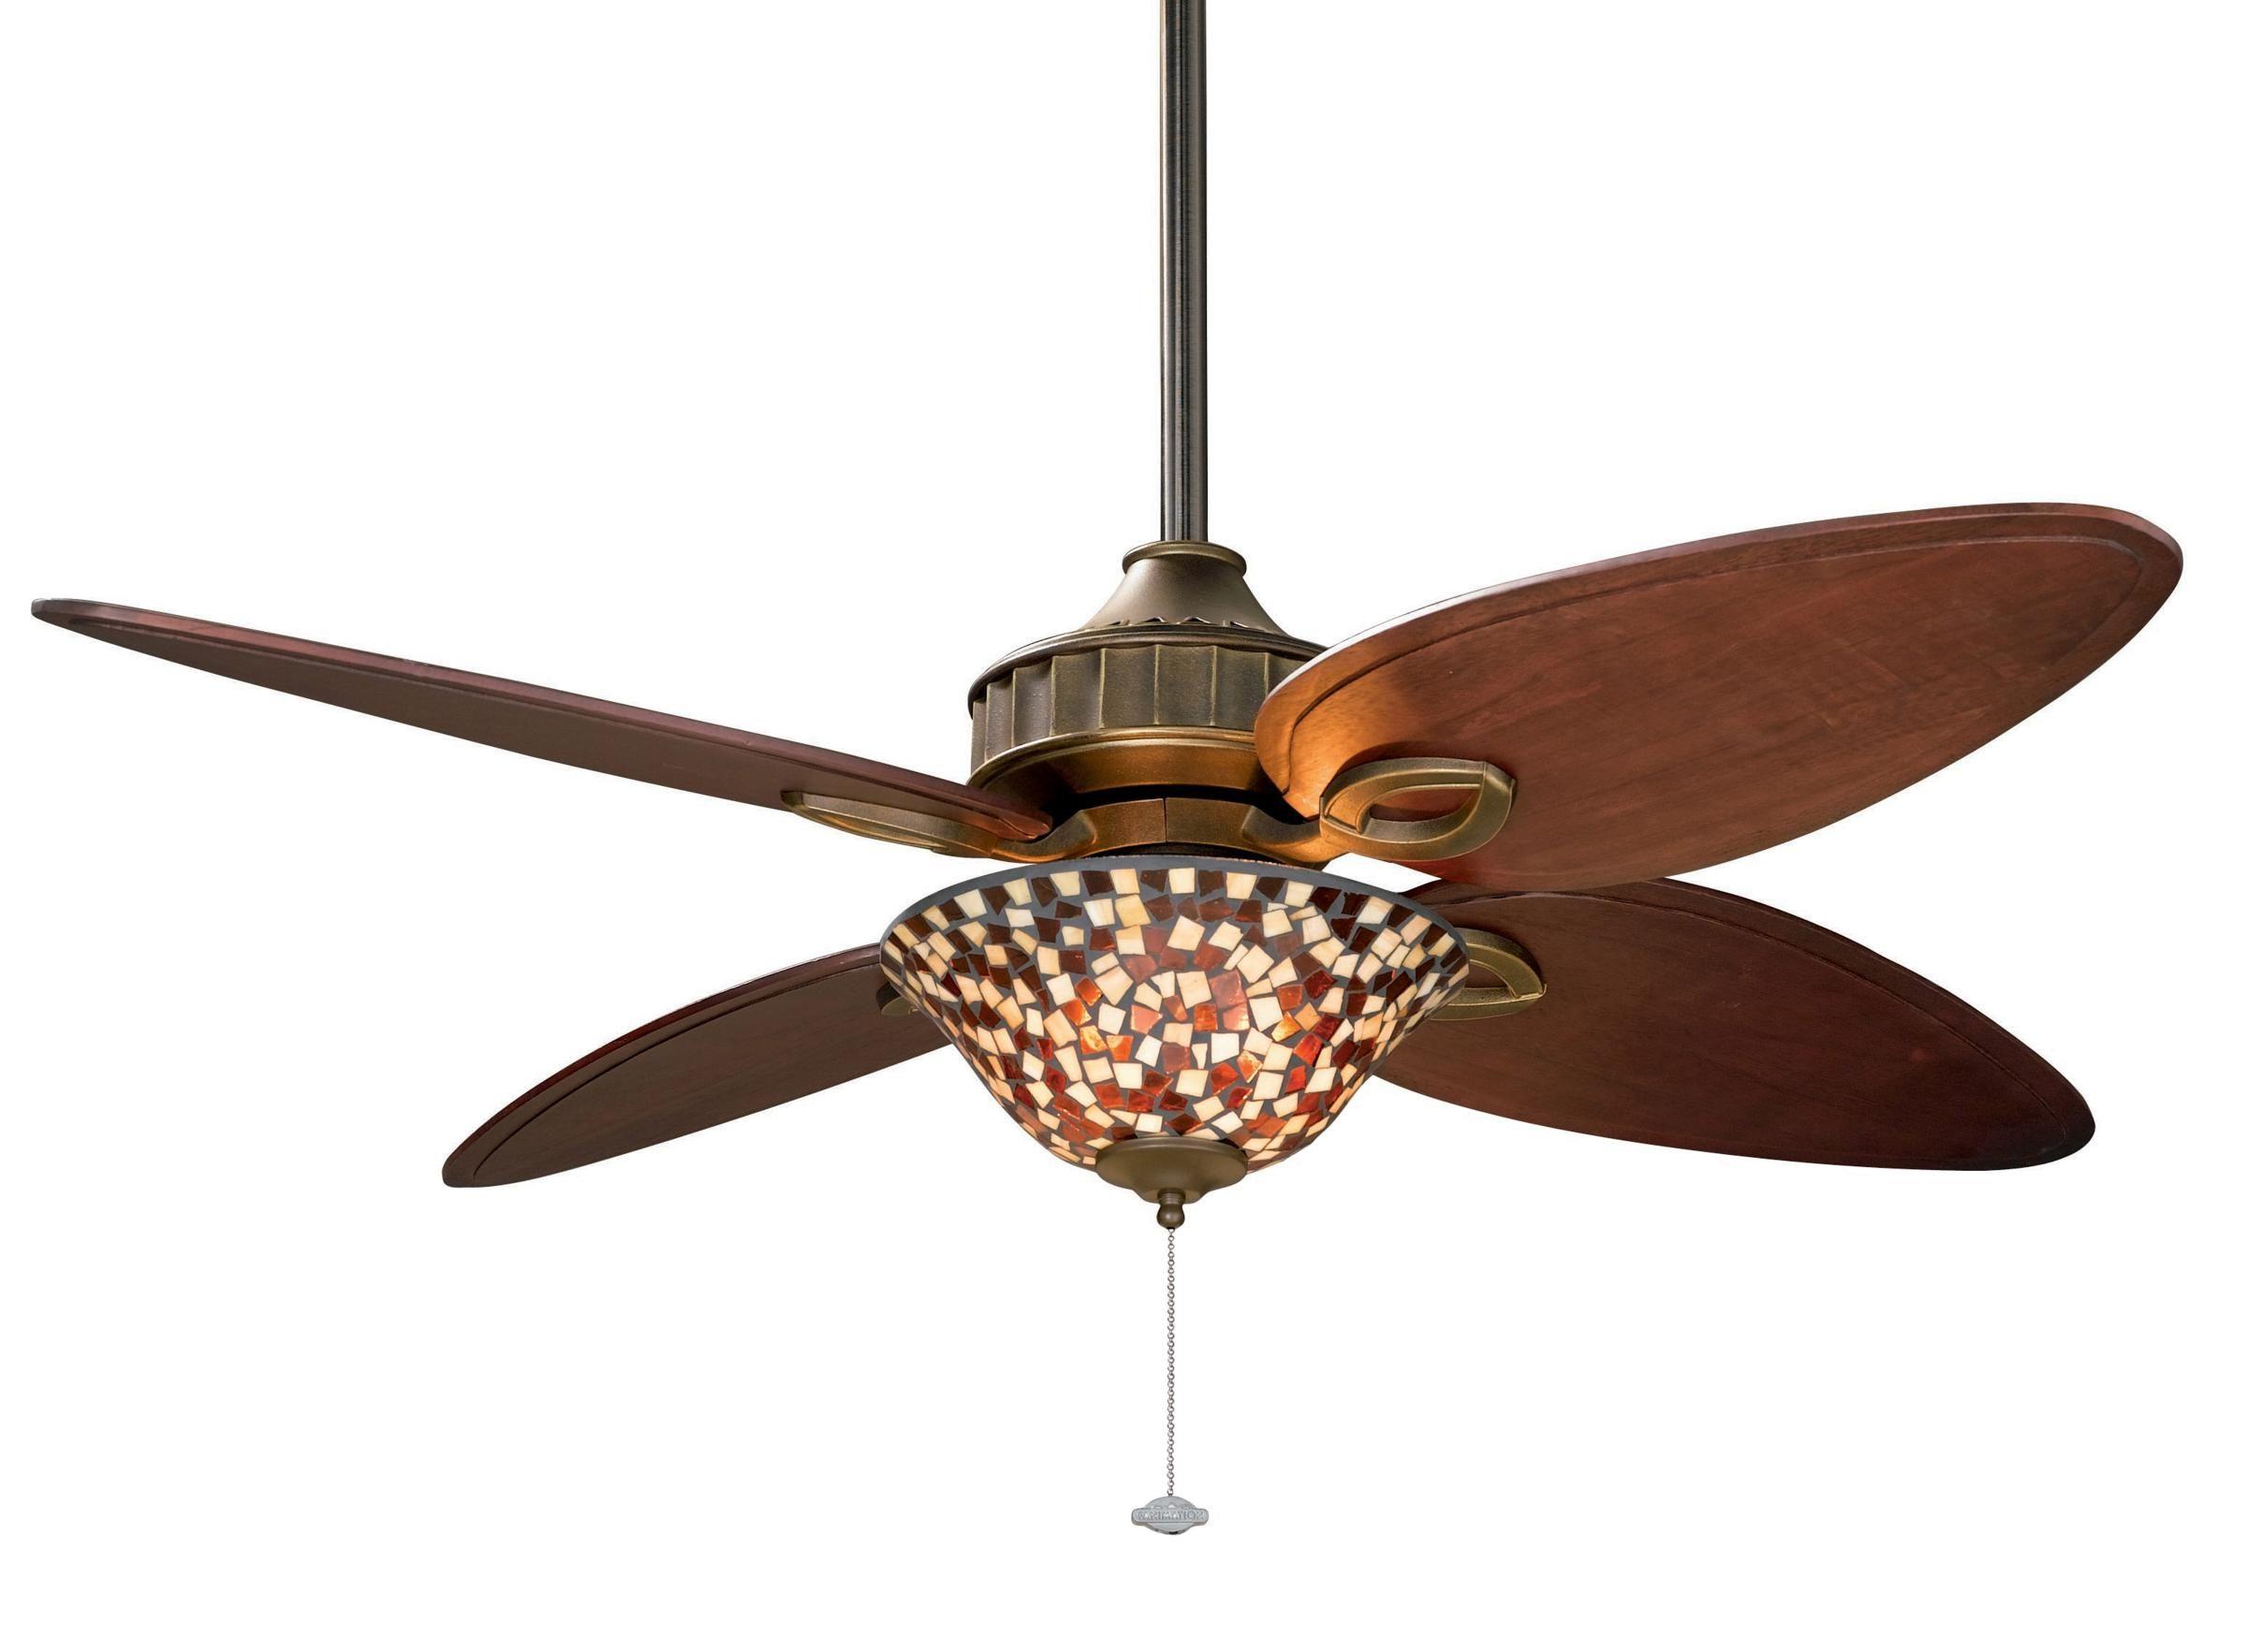 Fanimation Bayhill 250 Lb250vz F423vz G426 Airflow Rating 6471 Cfm Cubic Feet Per Minute Ceiling Fan Light Kit Ceiling Fan Ceiling Fan With Light